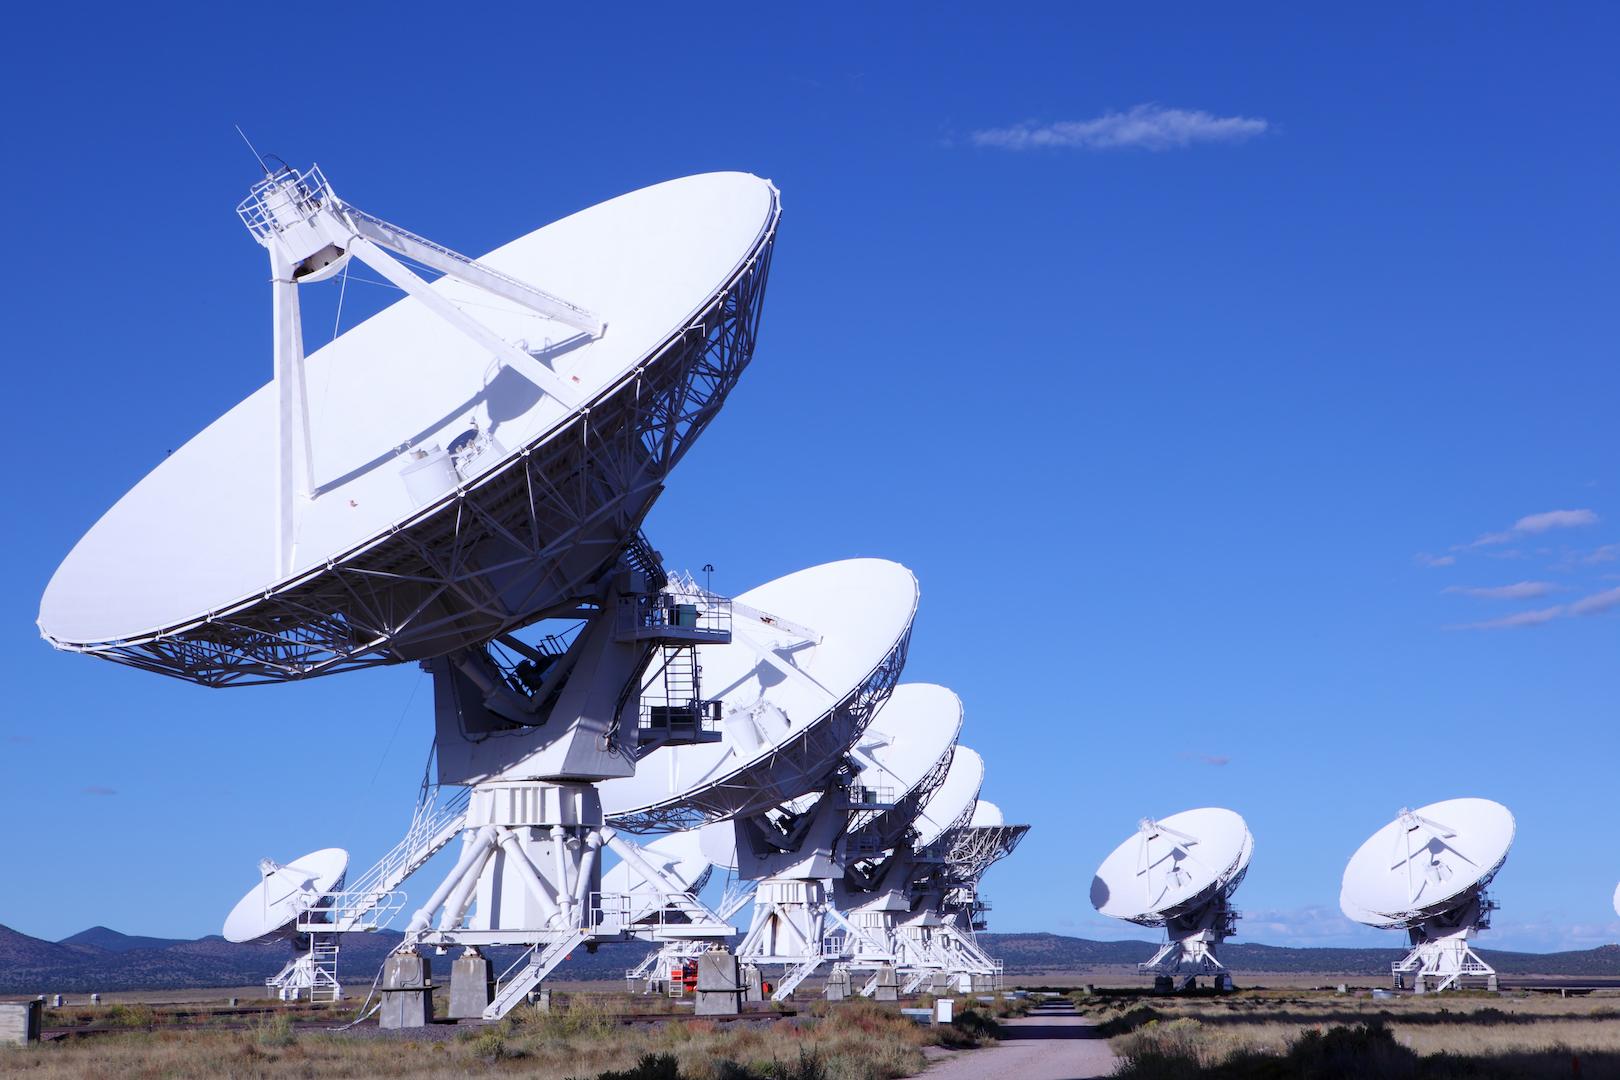 The Very Large Array: 40 years of groundbreaking radio astronomy